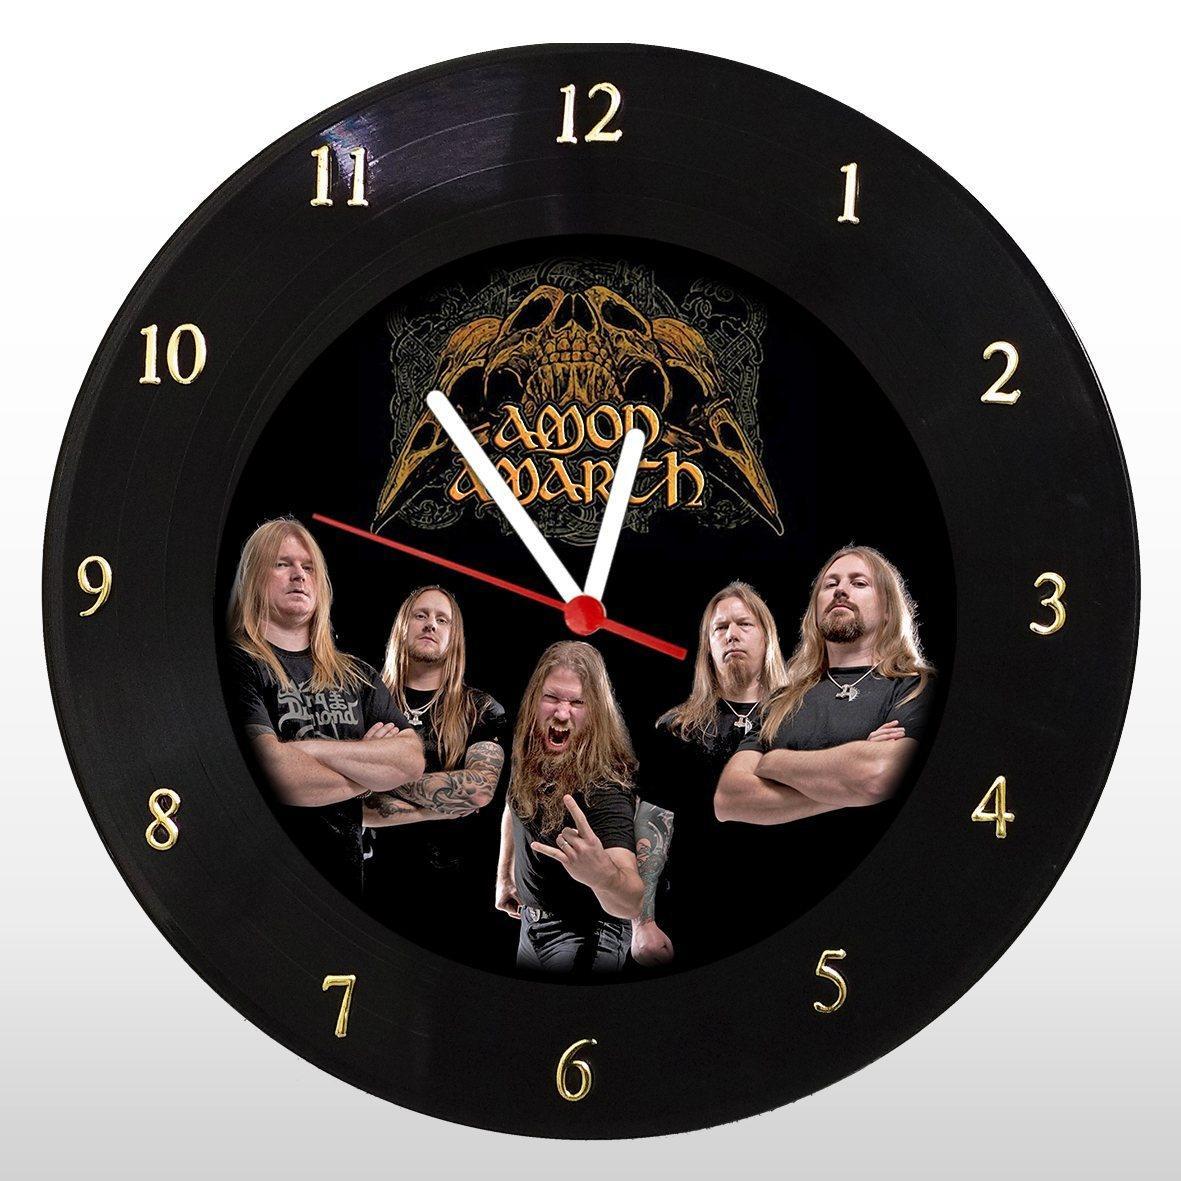 Amon Amarth - Relógio de Parede em Disco de Vinil - Mr. Rock